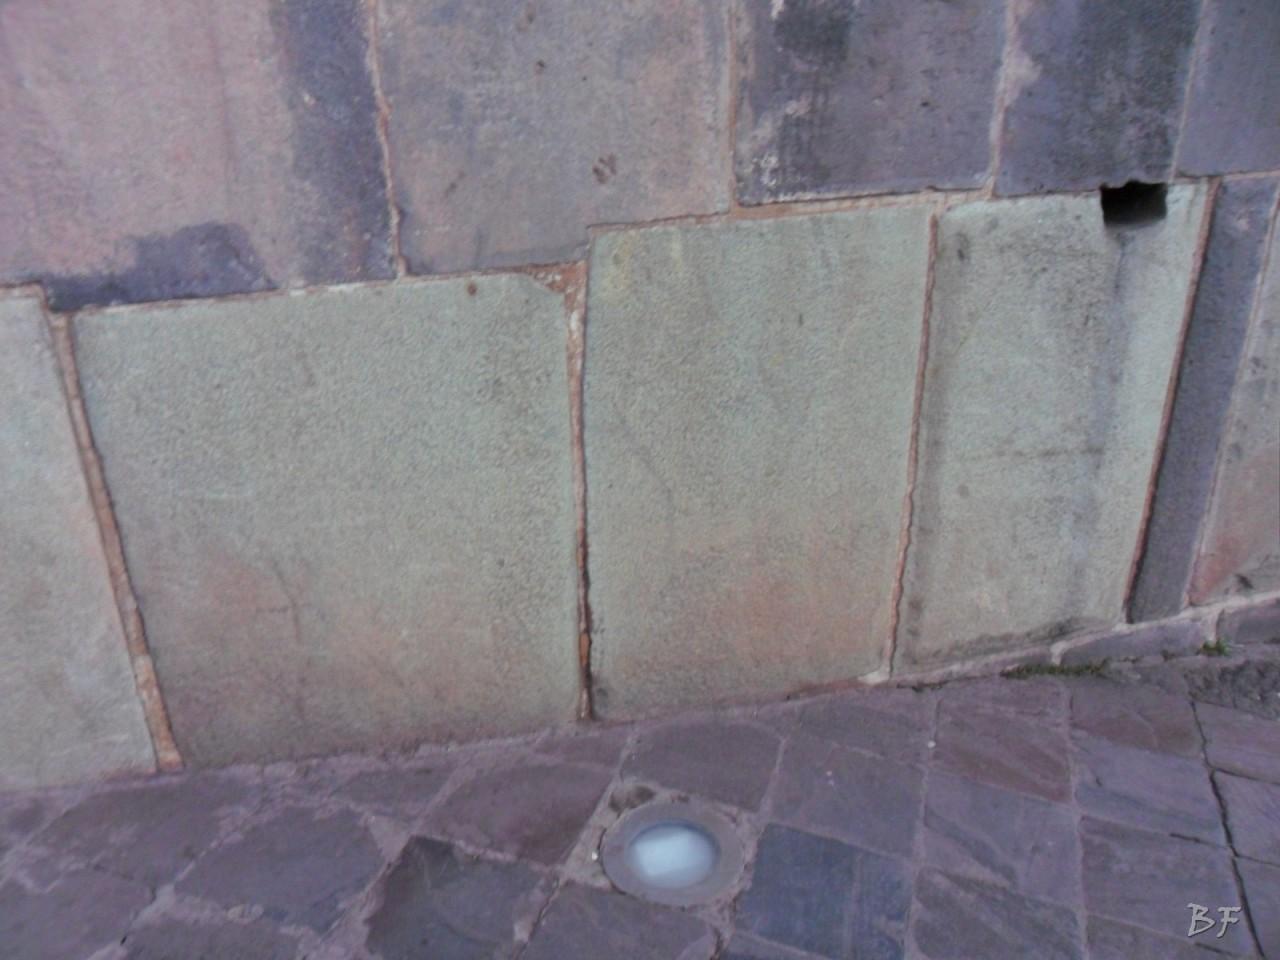 Mura-Poligonali-Megaliti-Tempio-Coricancha-Cusco-Perù-12